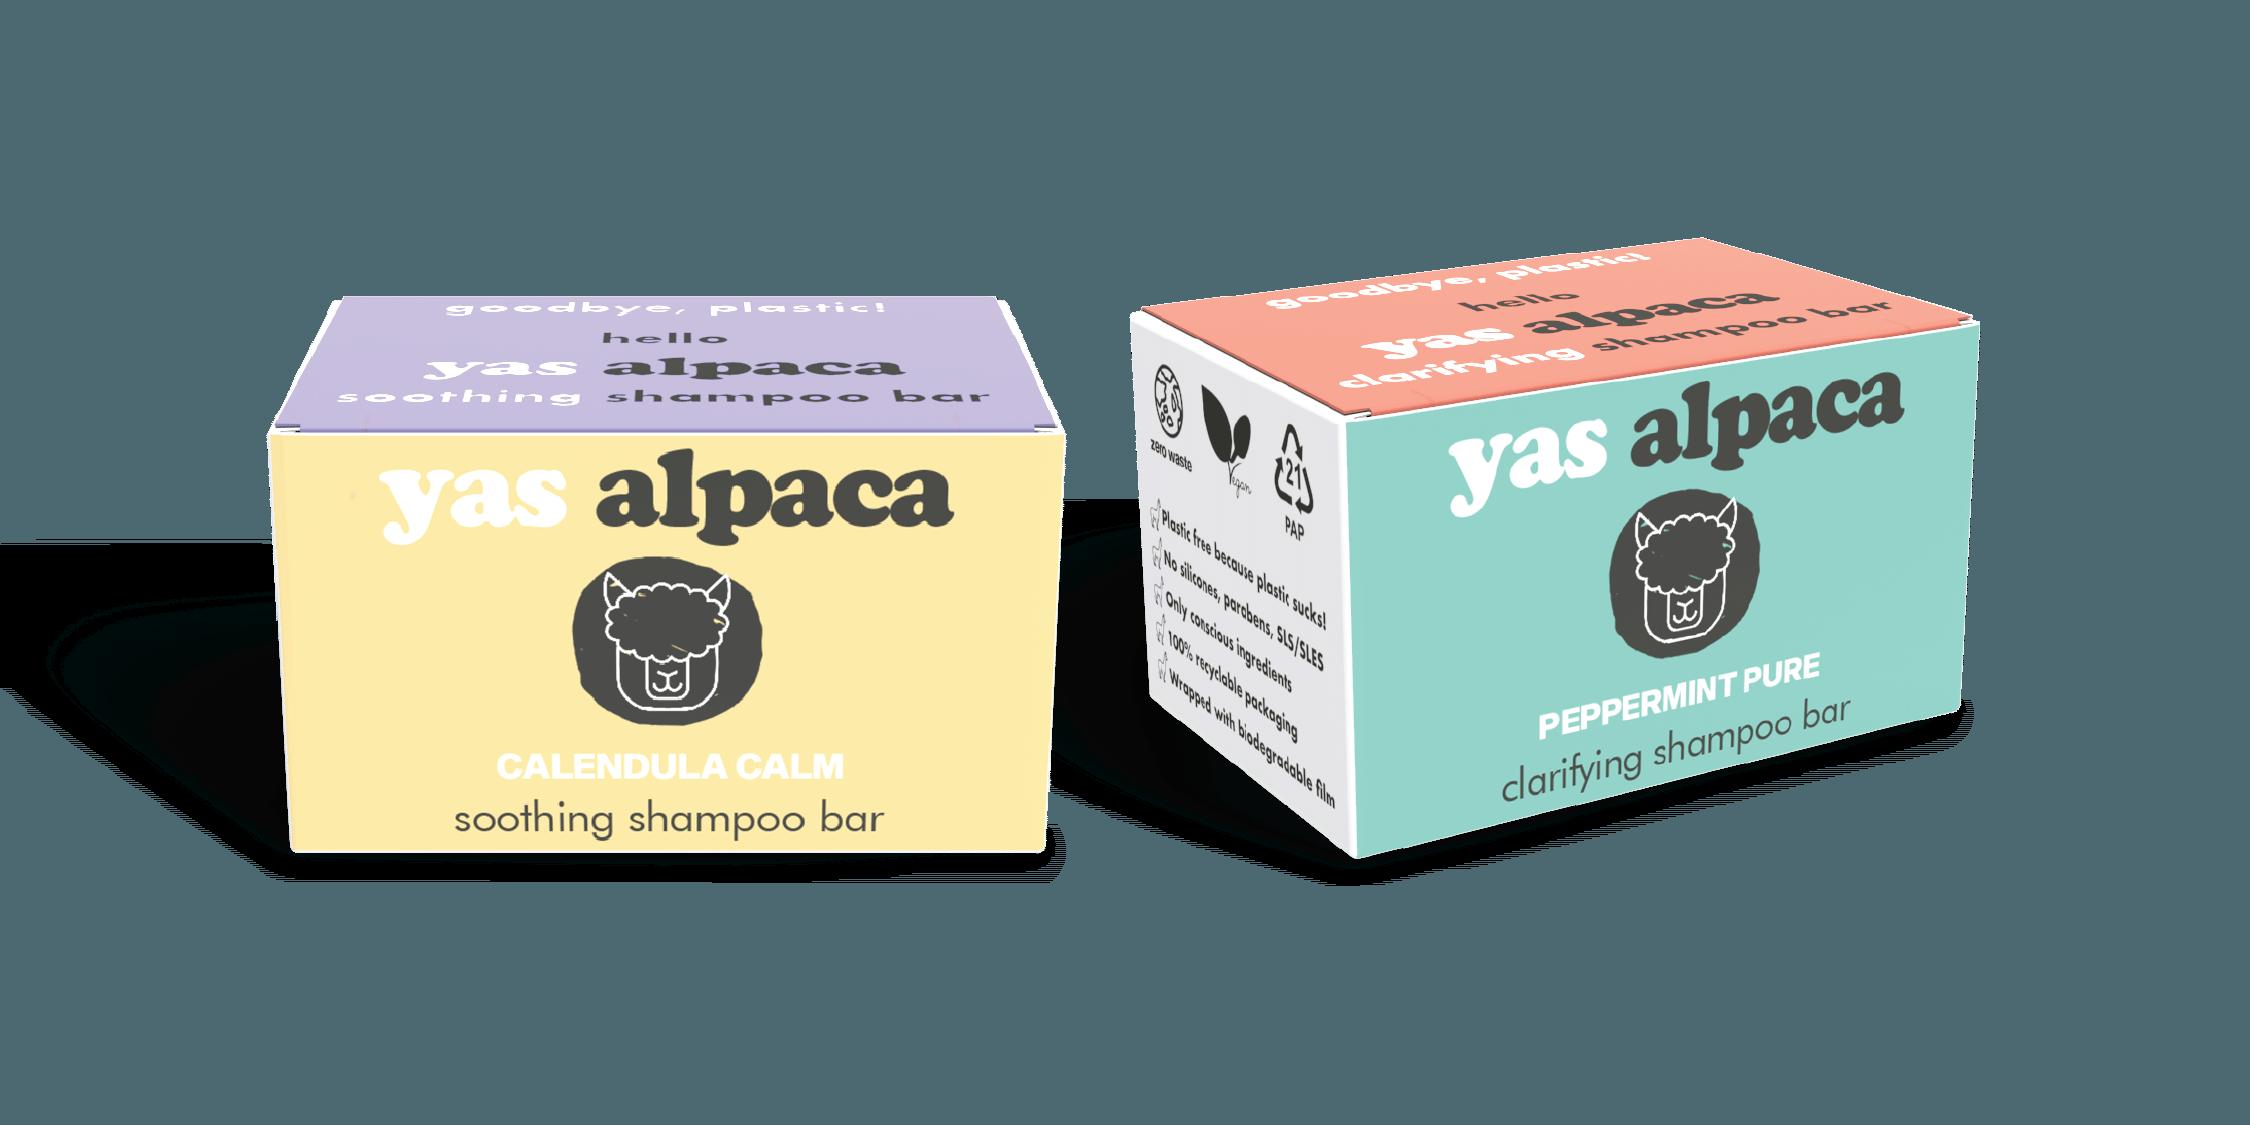 Packaging boxes of Yas Alpaca's Calendula Calm soothing shampoo bar and Peppermint Pure clarifying shampoo bar.